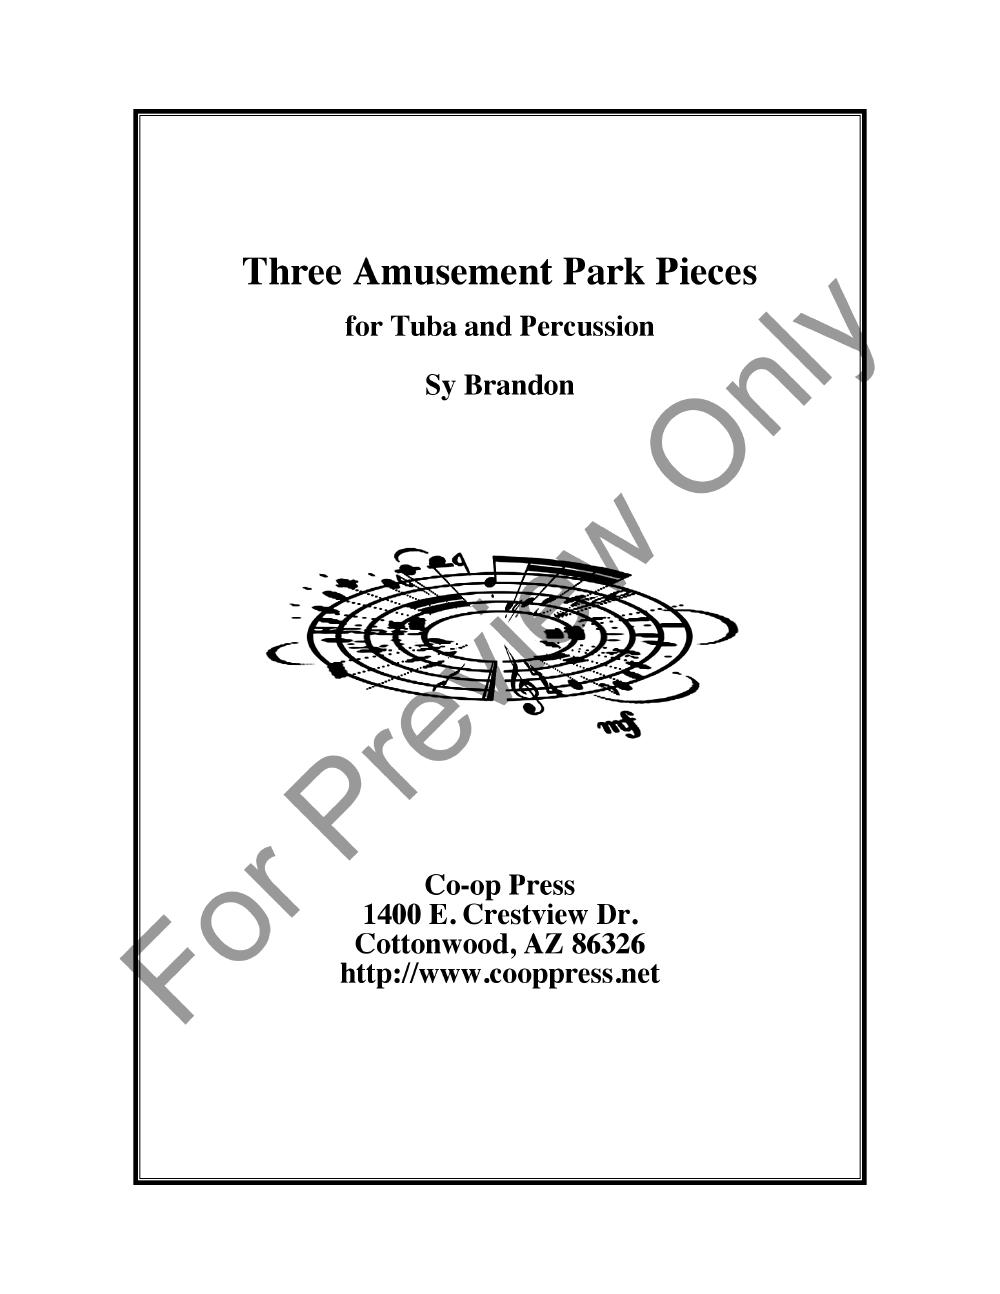 Three Amusement Park Pieces Thumbnail